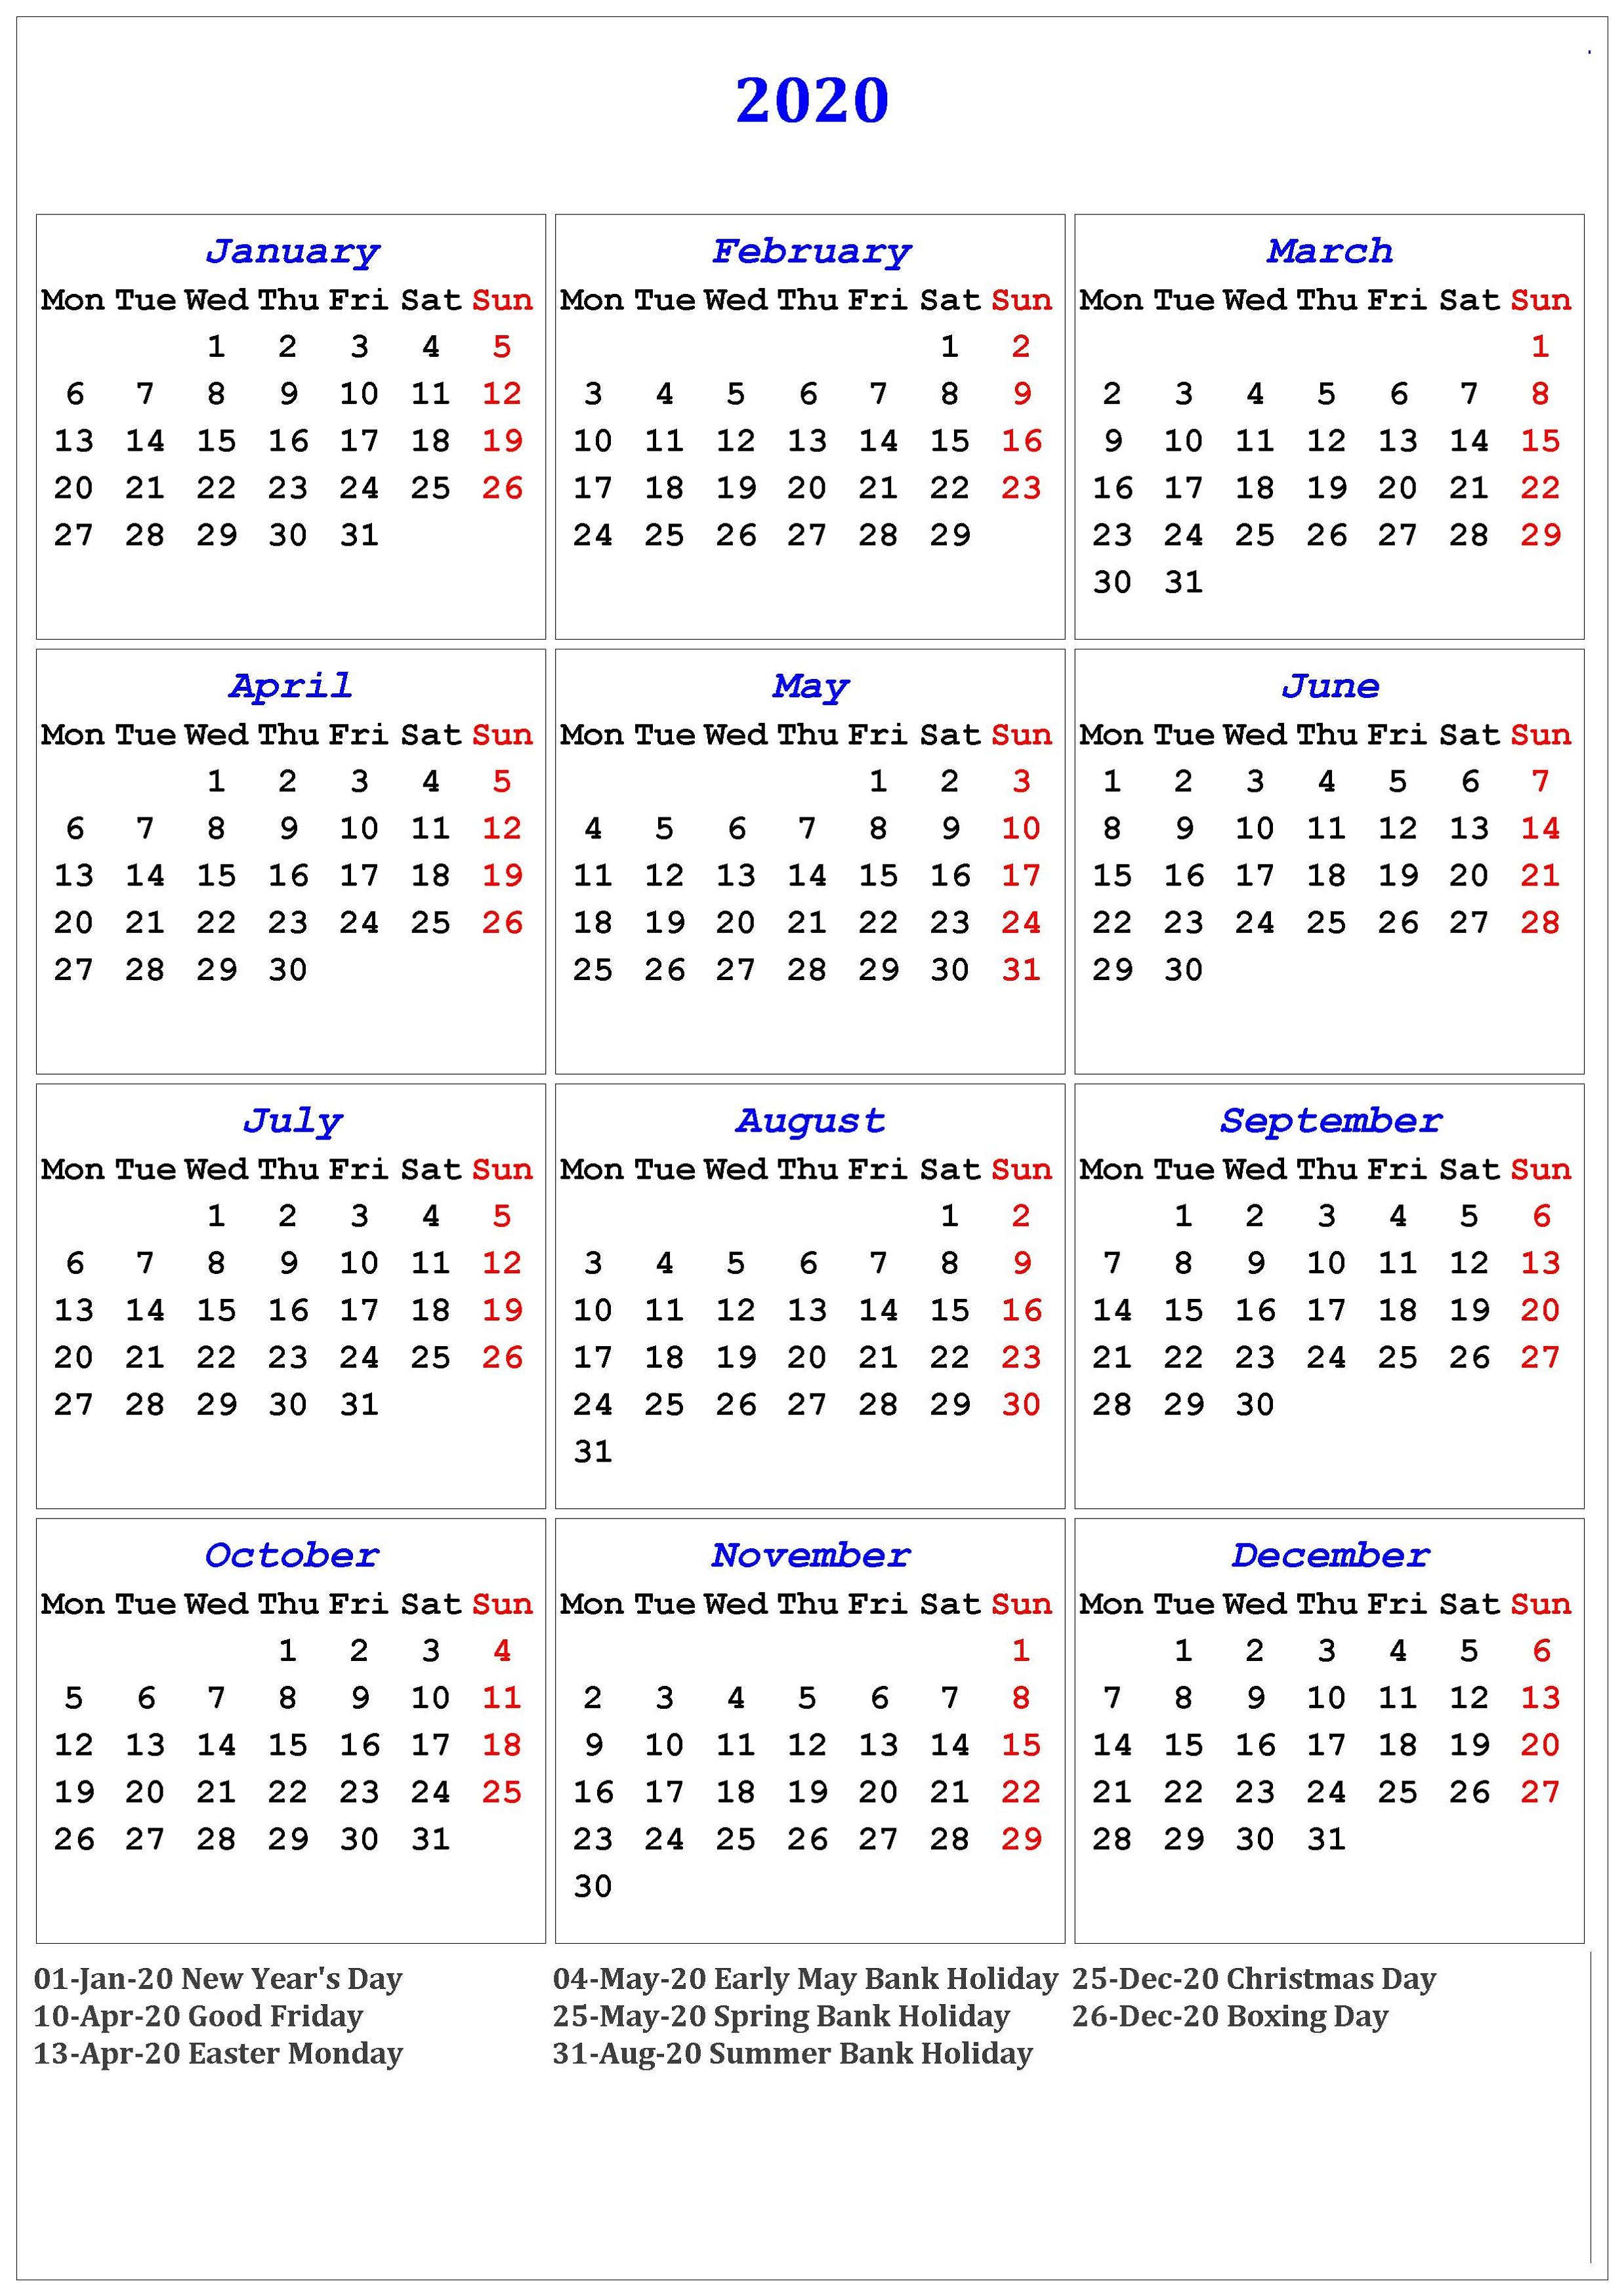 2020 Calendar Printable With Holidays And Notes | Calendar